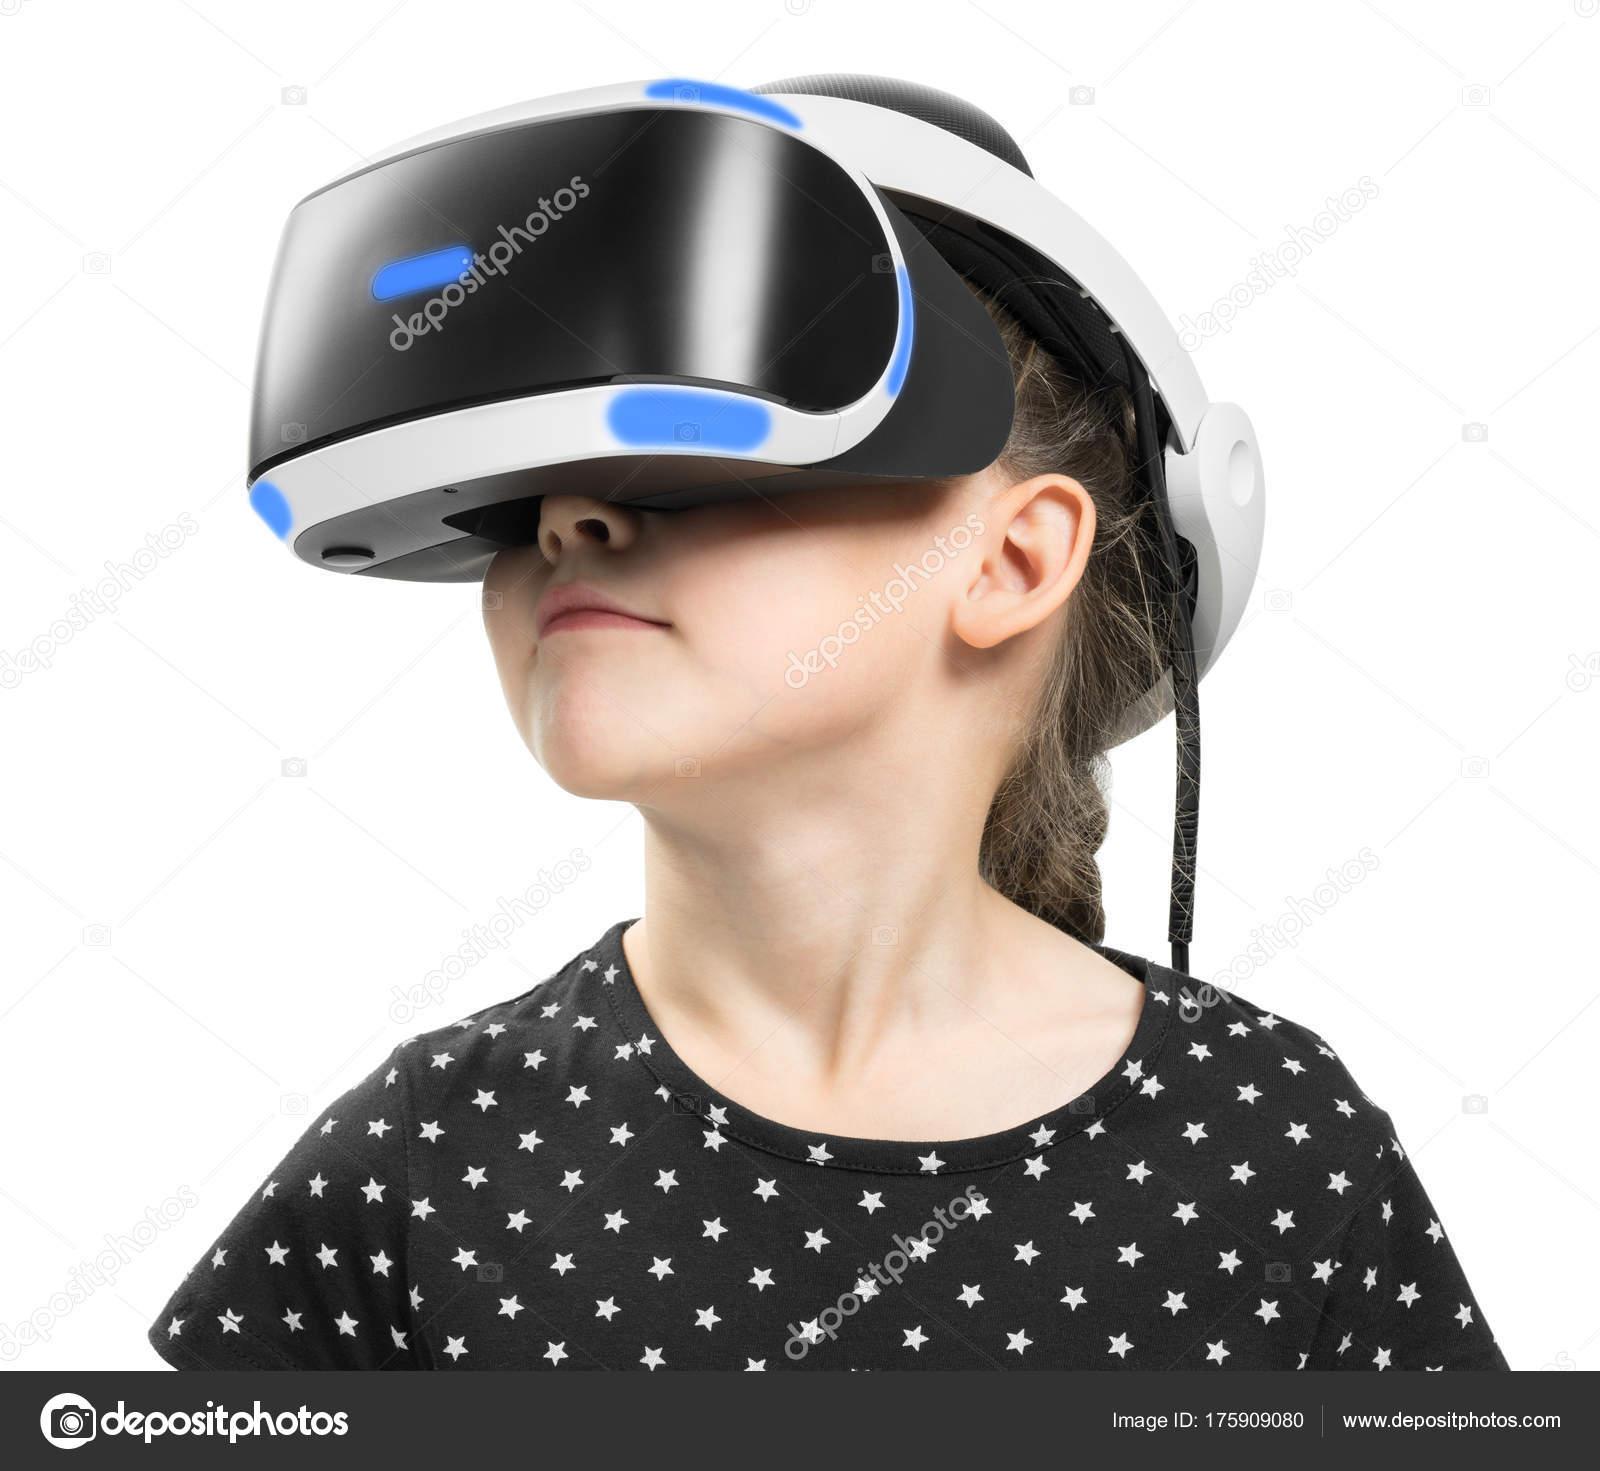 b5dd0026e93 Virtual Reality Helmet - Best Helmet 2017